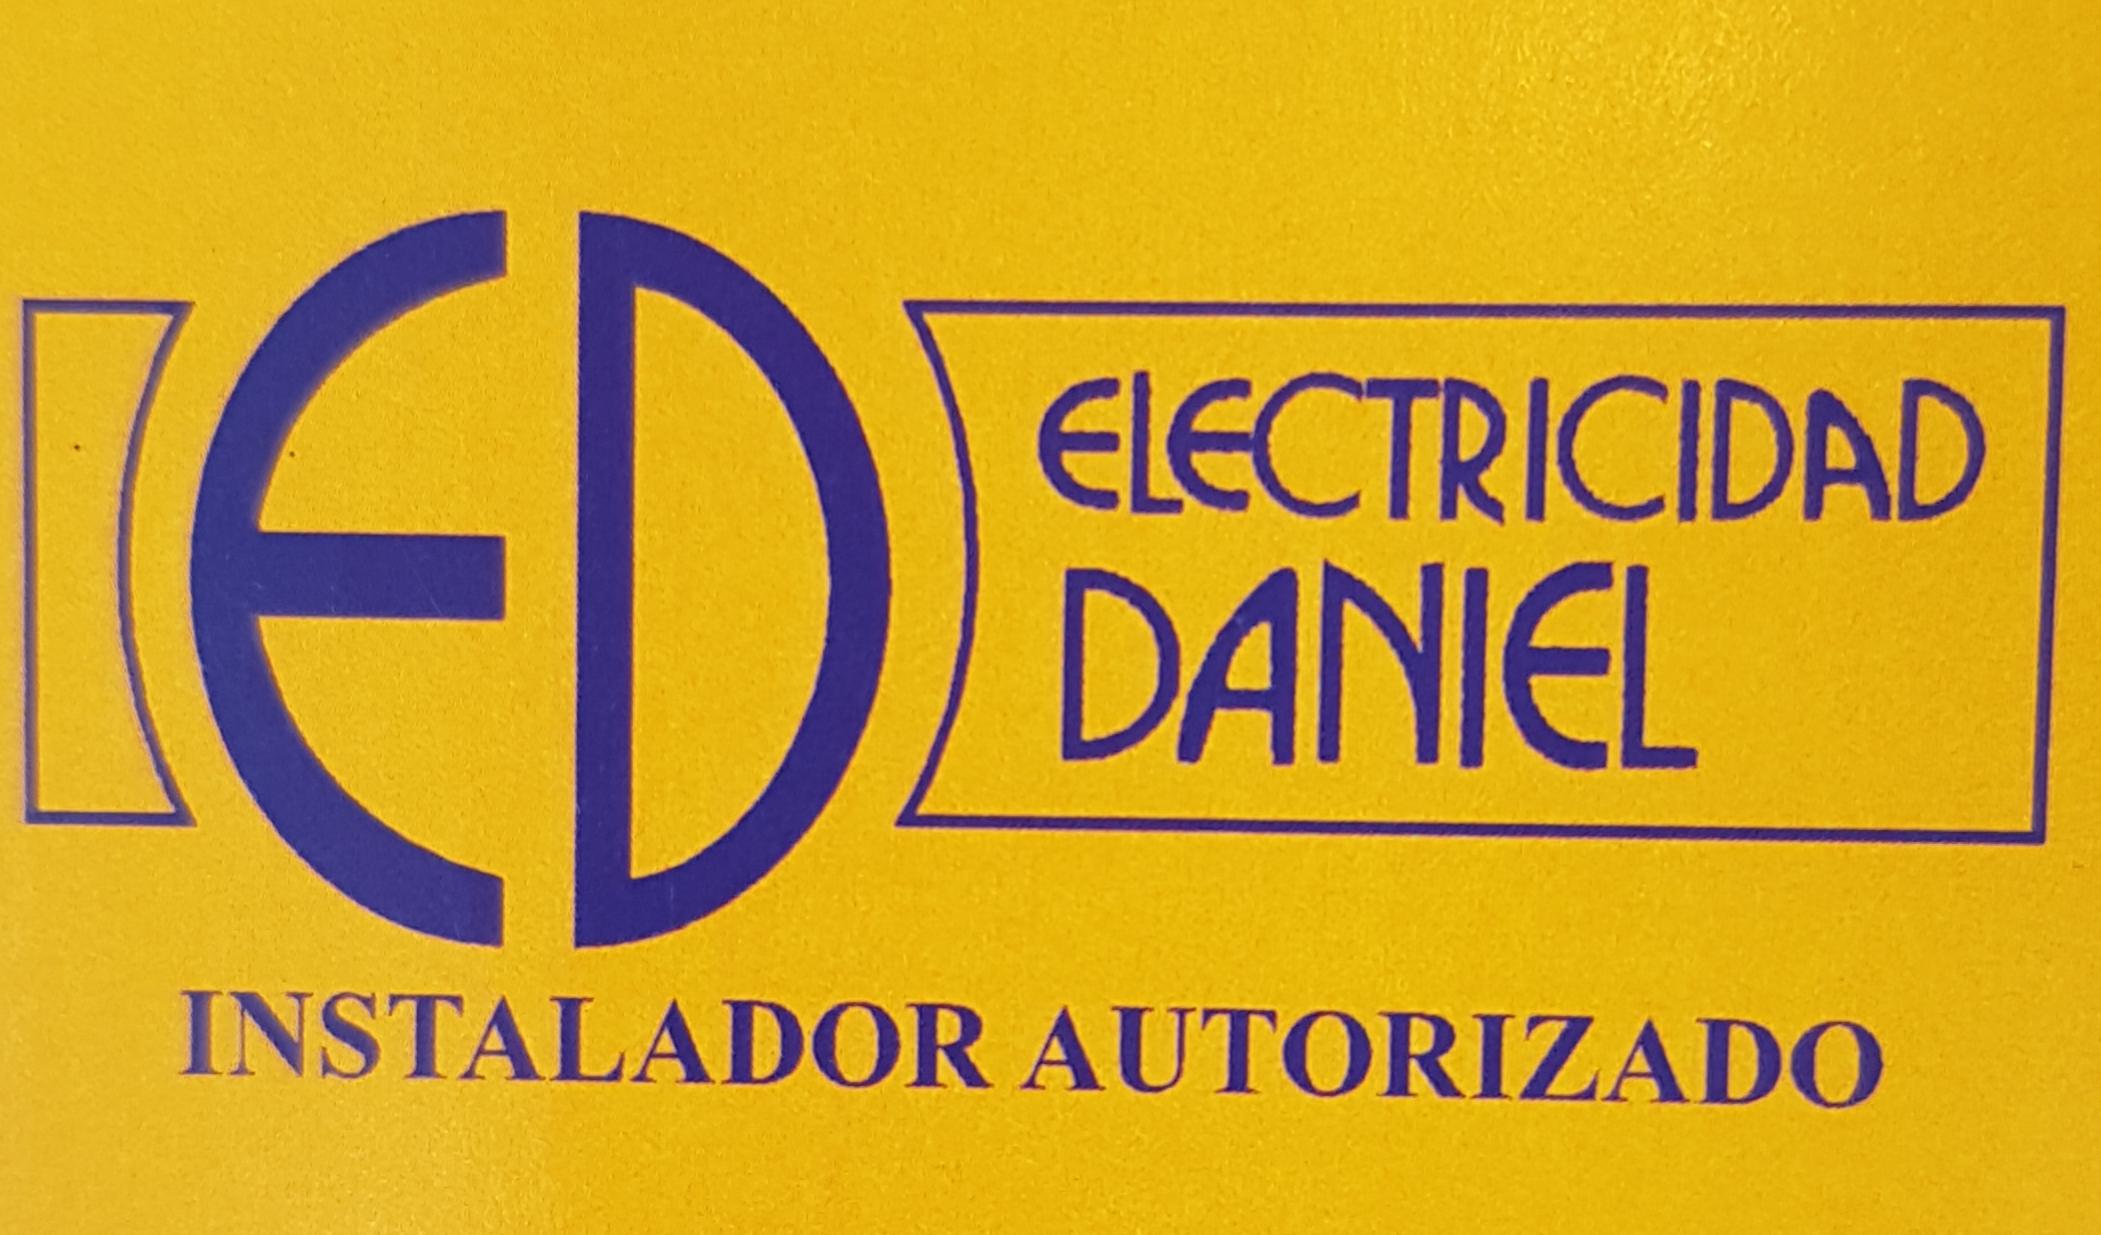 Electricidad Daniel S.L.